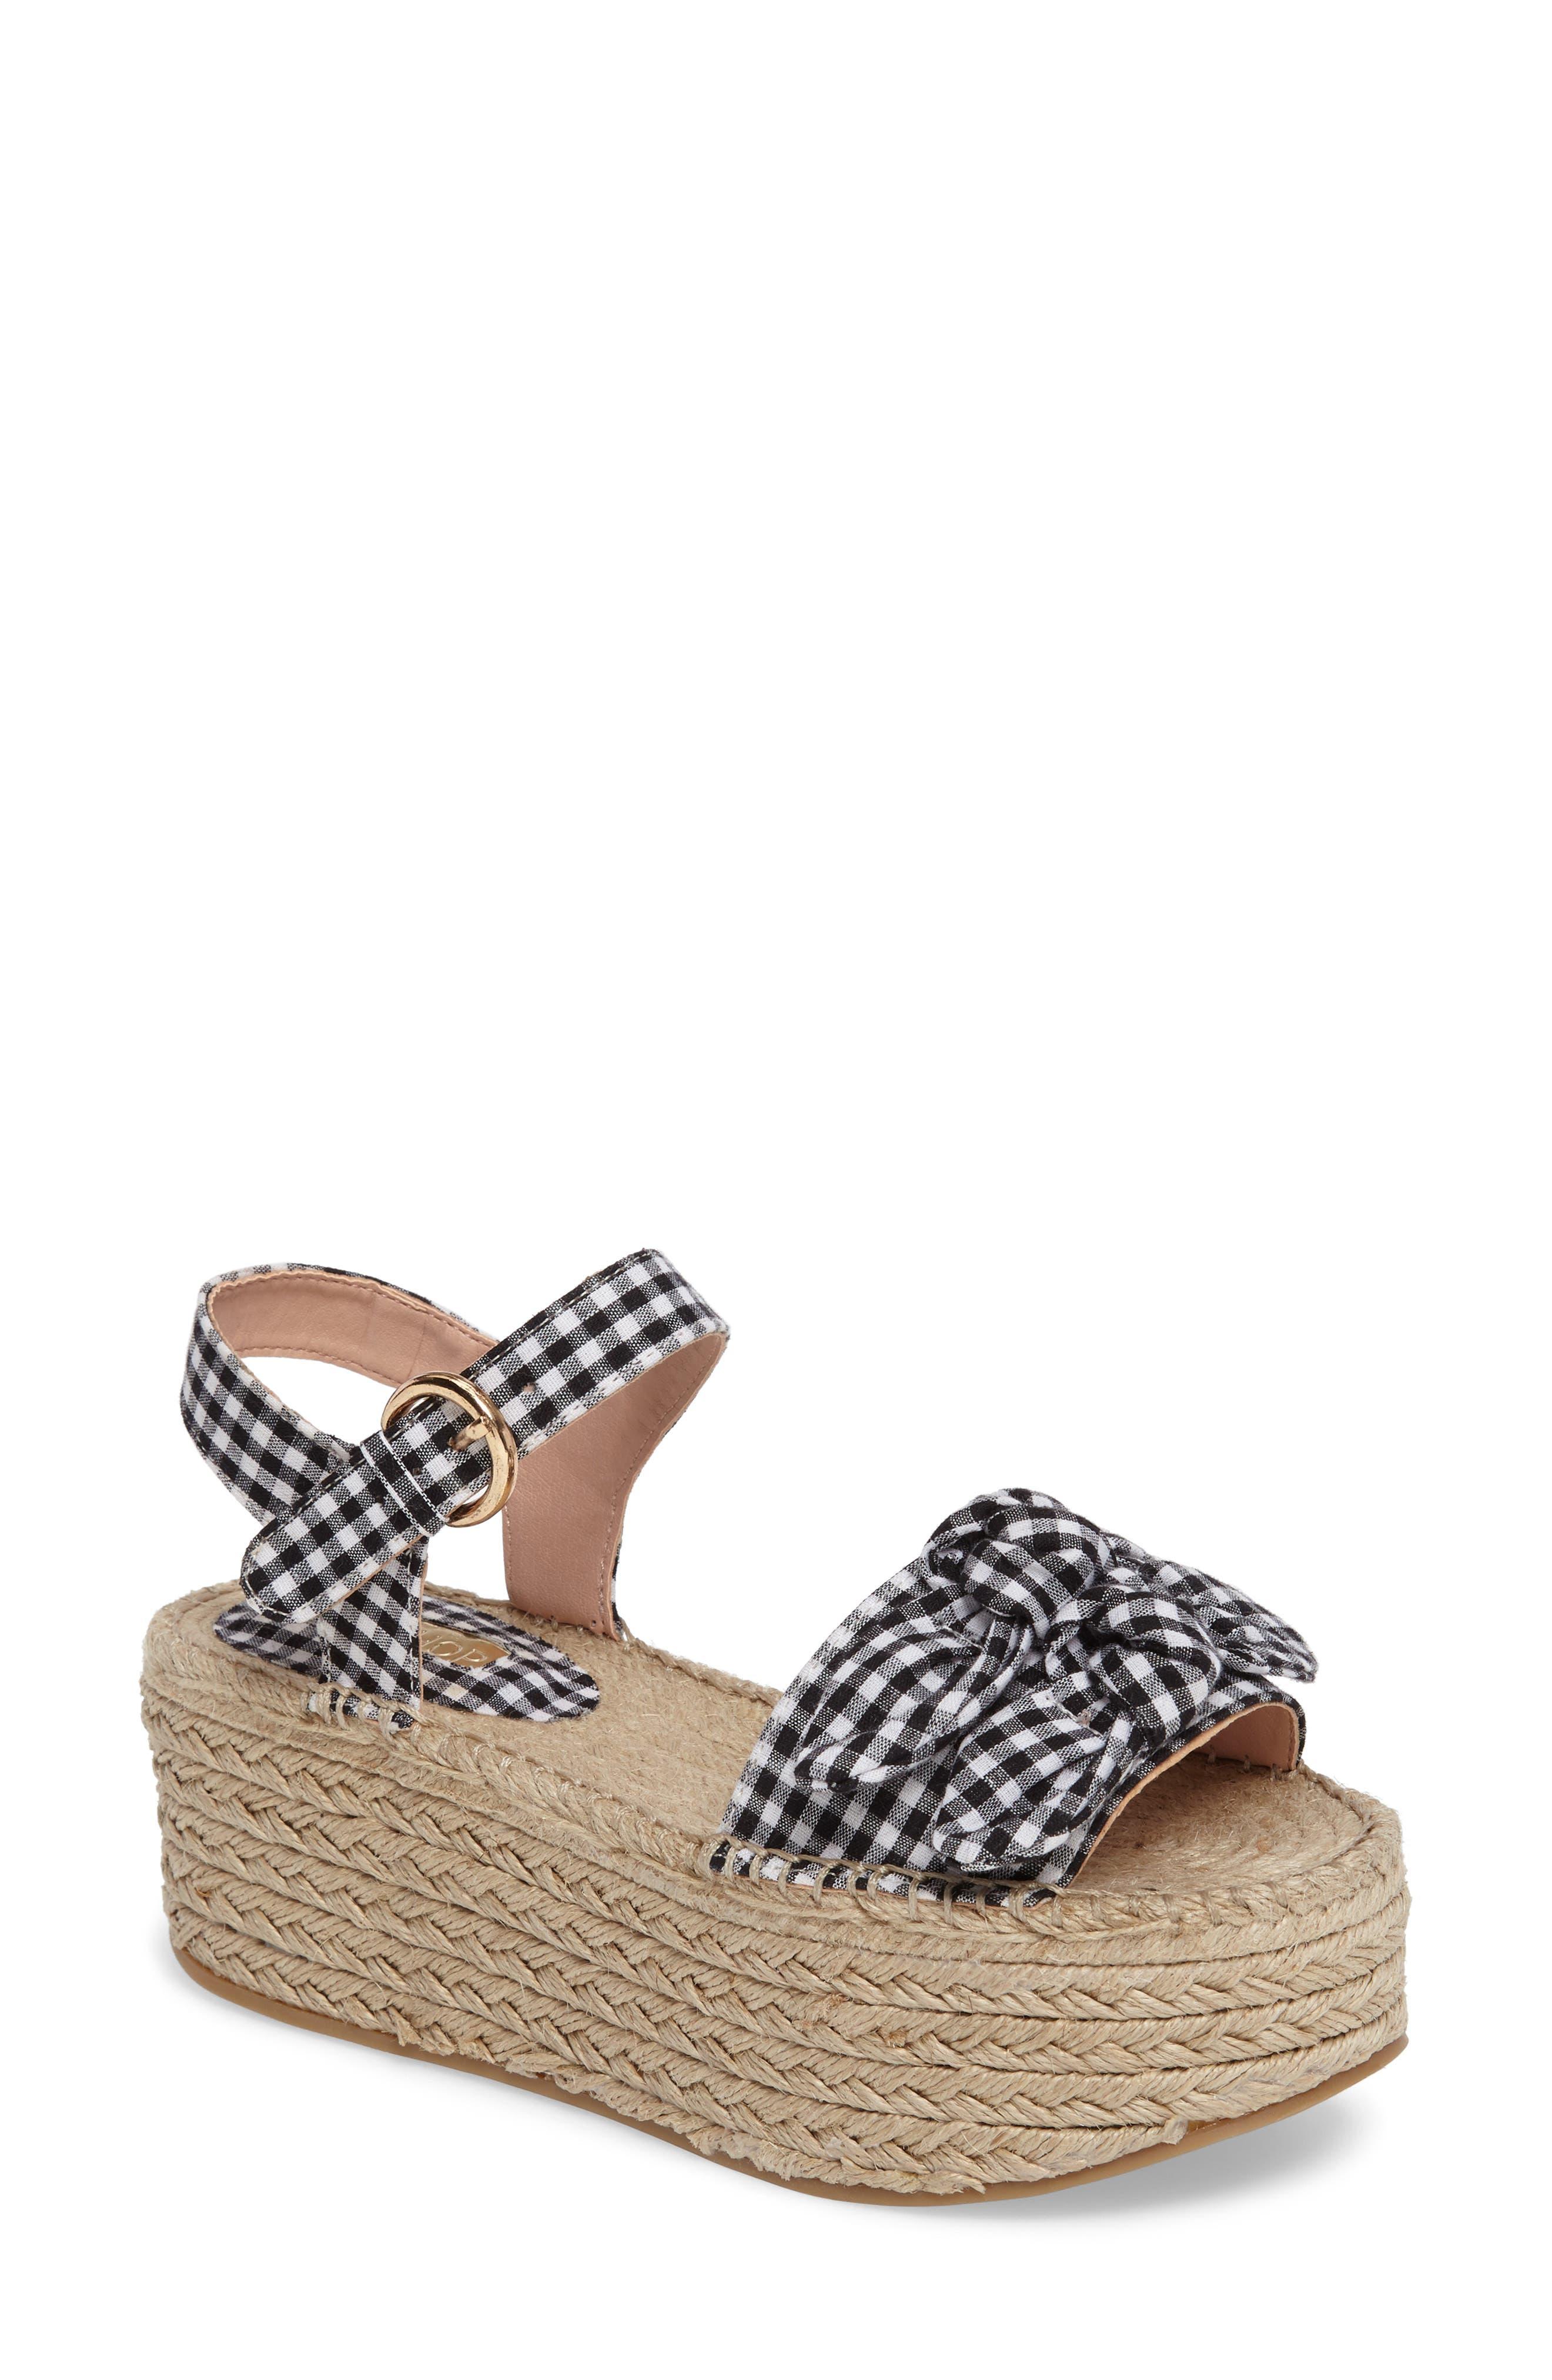 Alternate Image 1 Selected - Topshop Wendy Gingham Platform Sandal (Women)